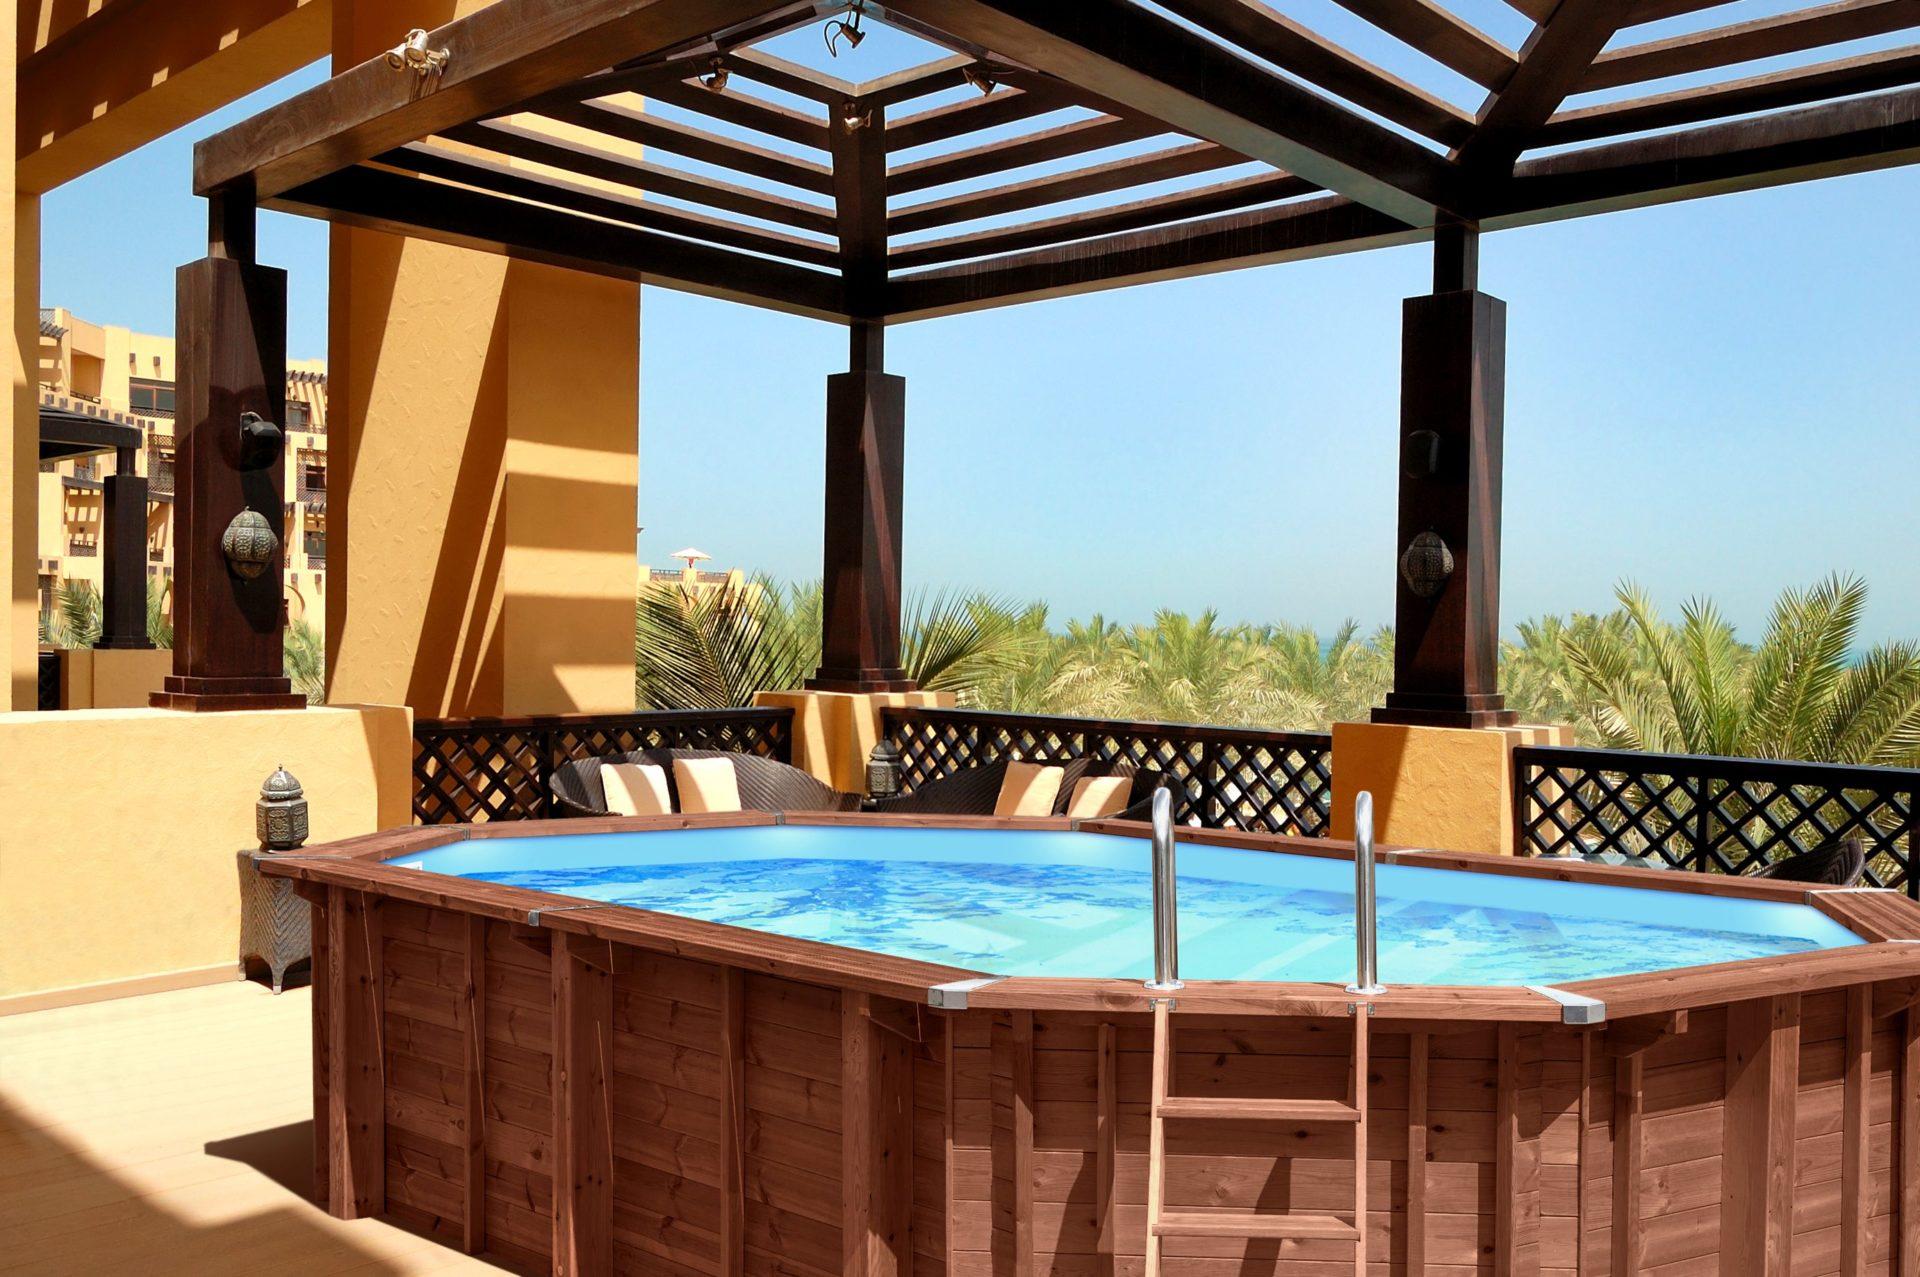 abatec wooden pools premium line Puerto Rico